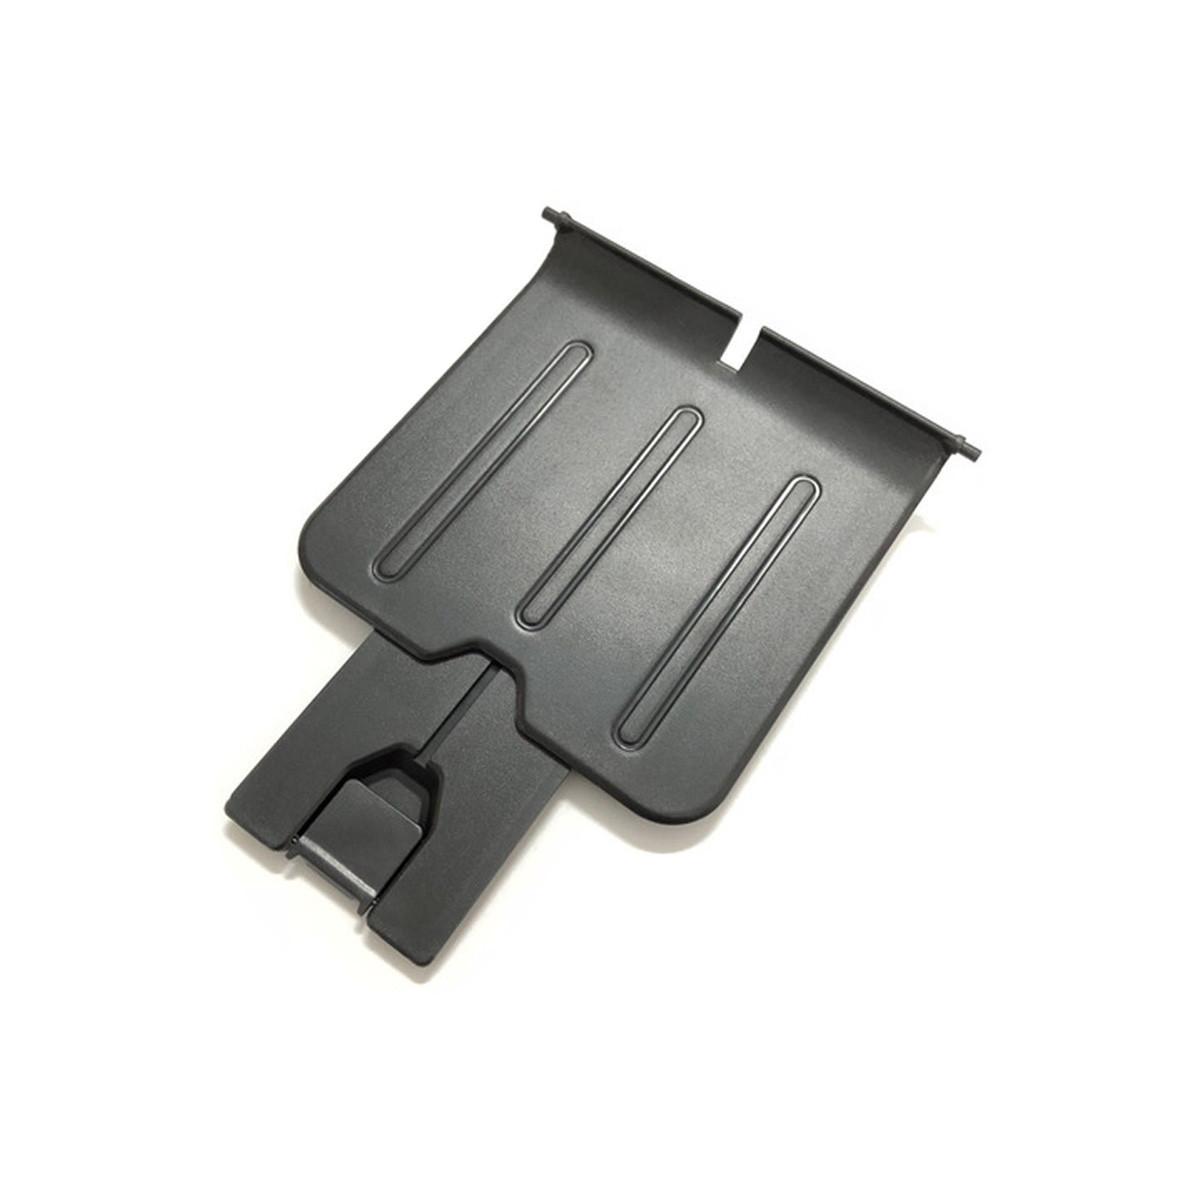 Bandeja de Saída de Papel HP Específico para P1102W P1102 | RM1-6903